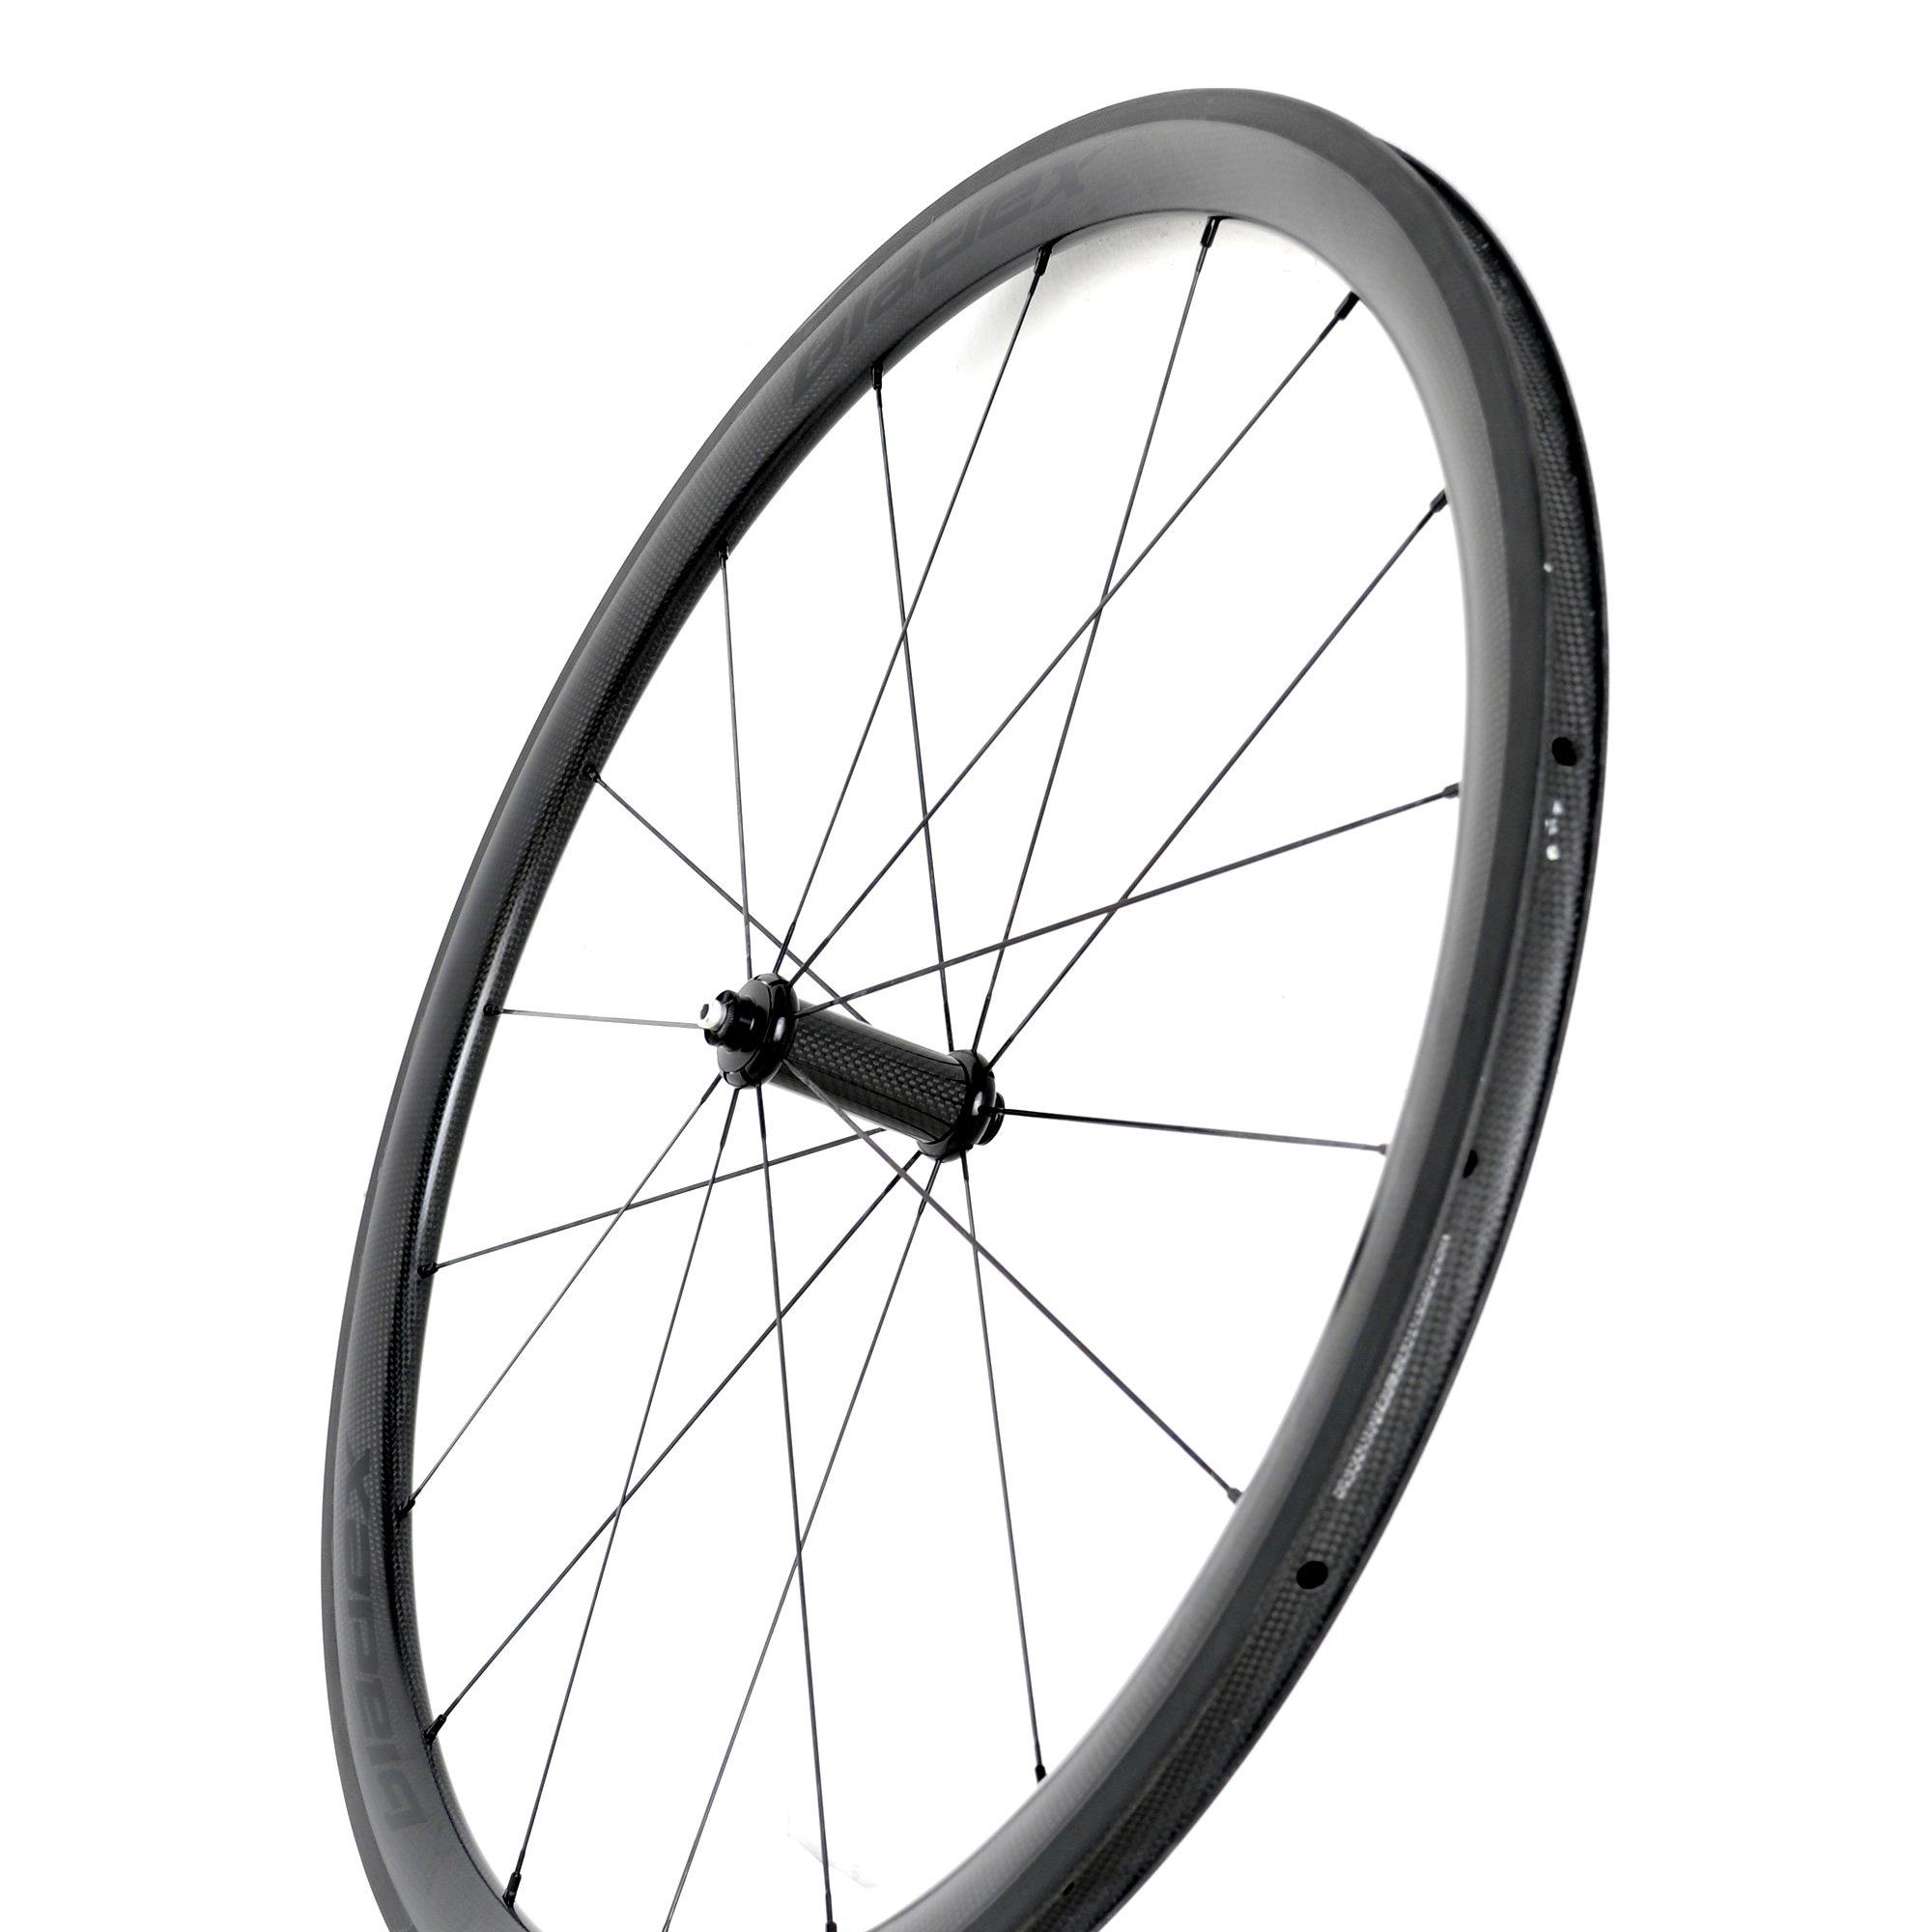 Carbon Road Bike Wheels